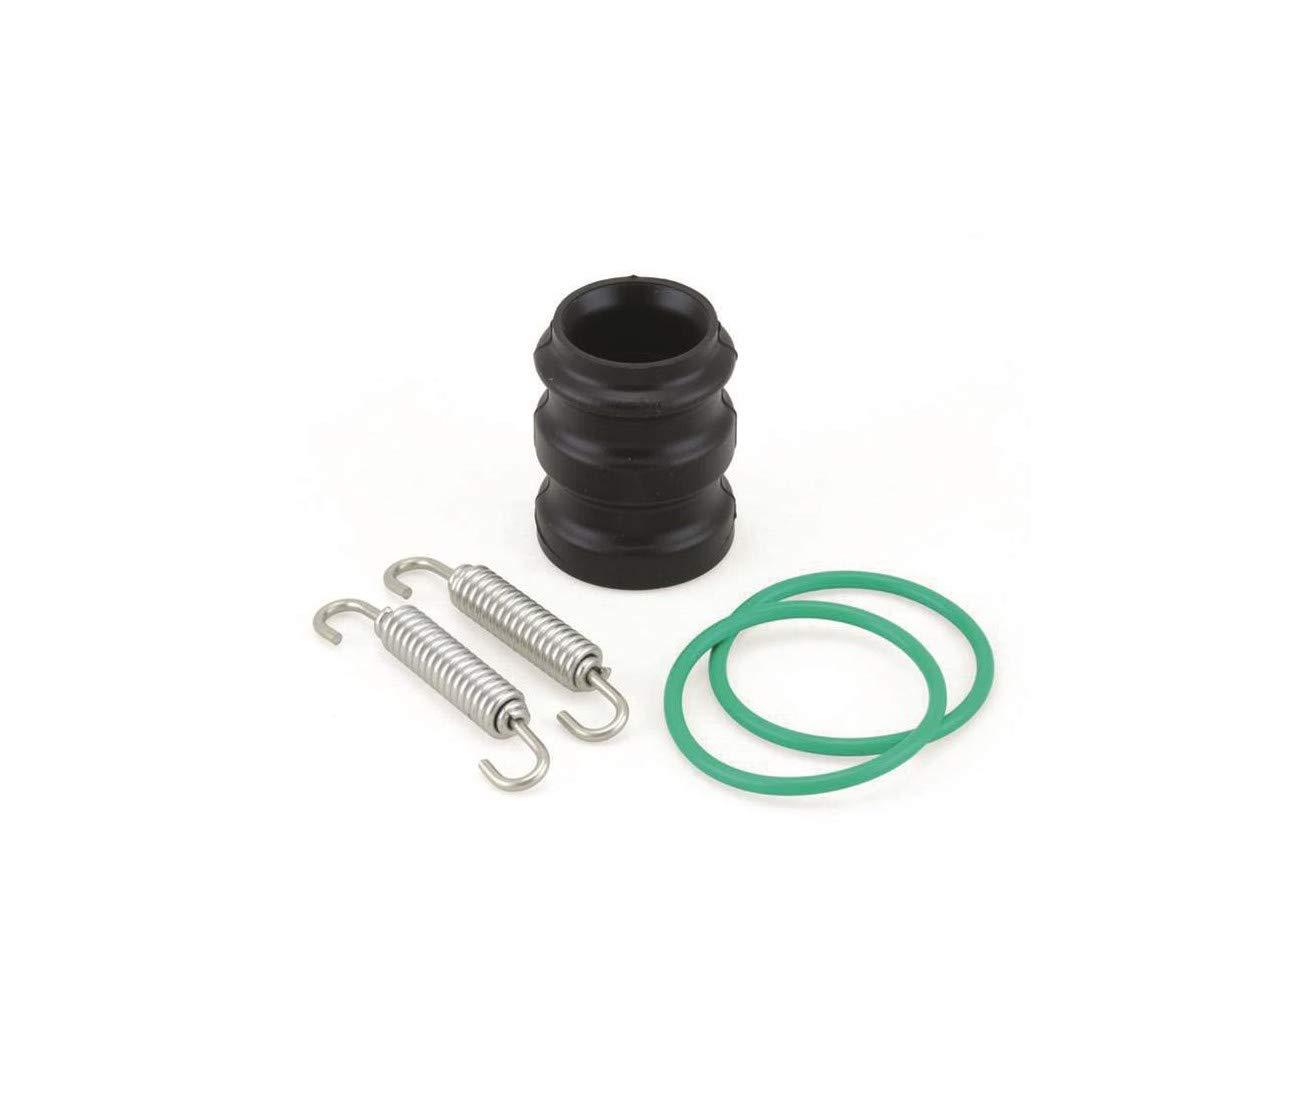 KTM SX 65/SX 85-kit Montage Auspuff Pro bolt-530193 HONDA